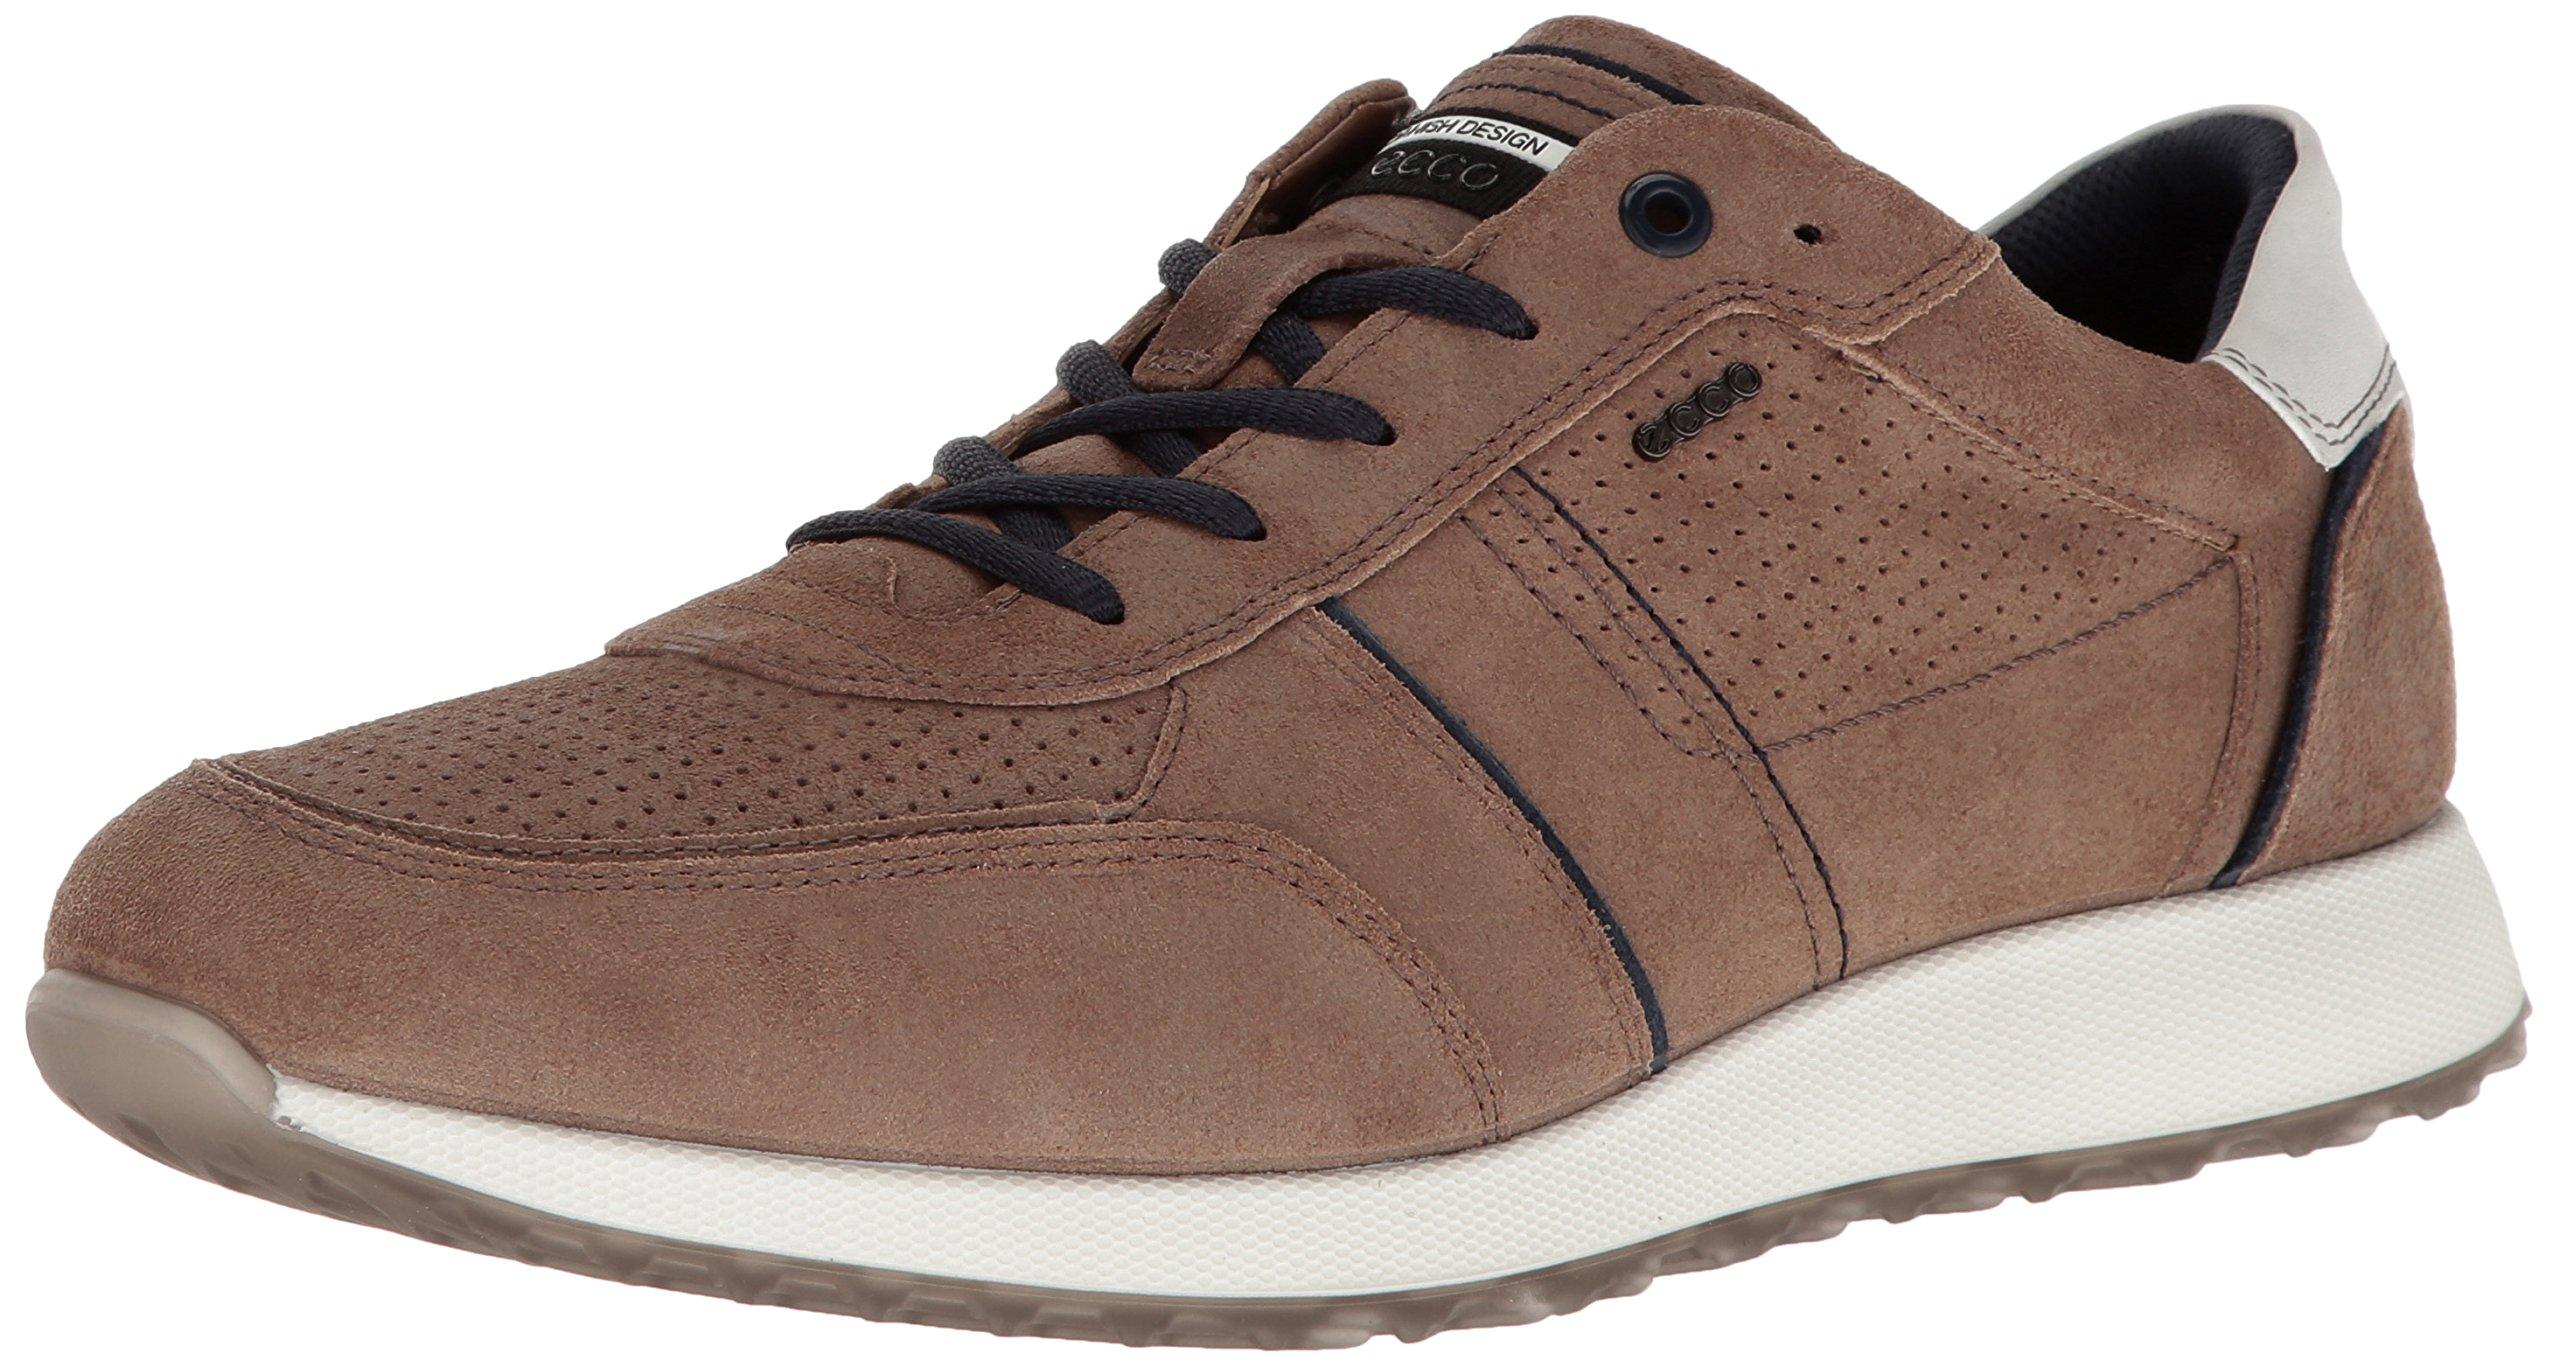 ECCO Men's Summer Sneak Fashion Sneaker, Navajo Brown/Marine, 40 EU/6-6.5 M US